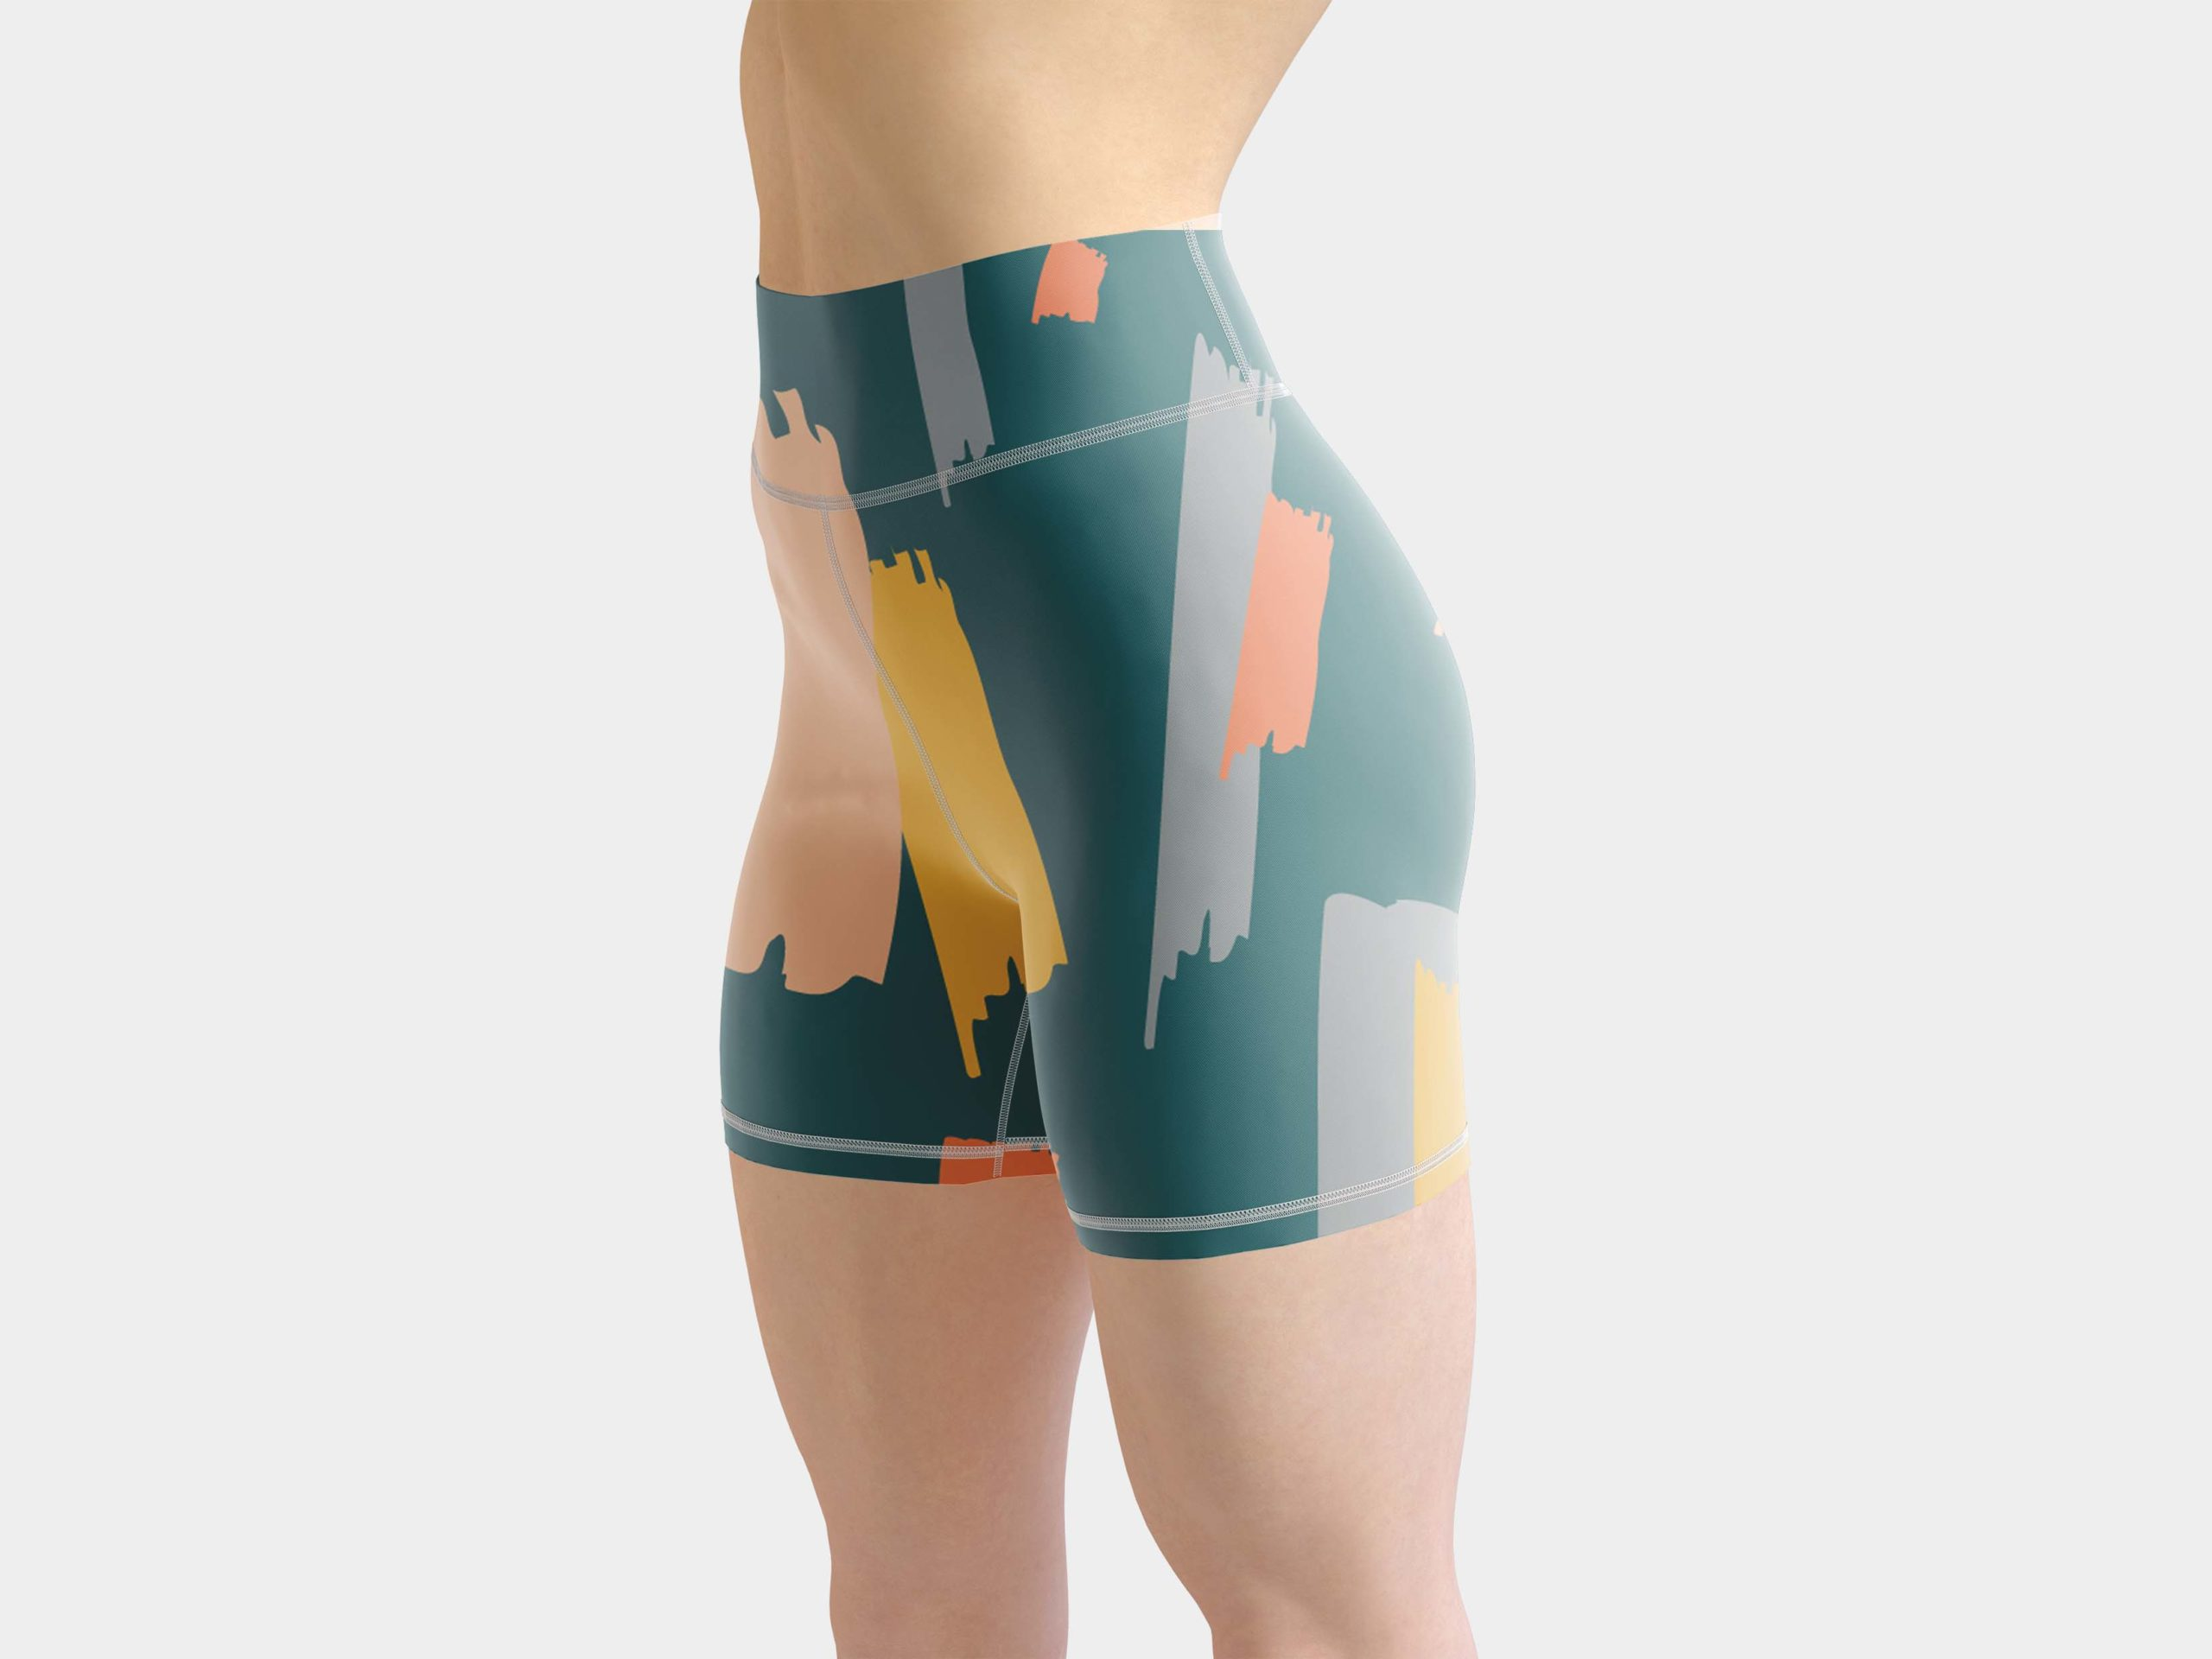 Free Training Women's Shorts Mockup